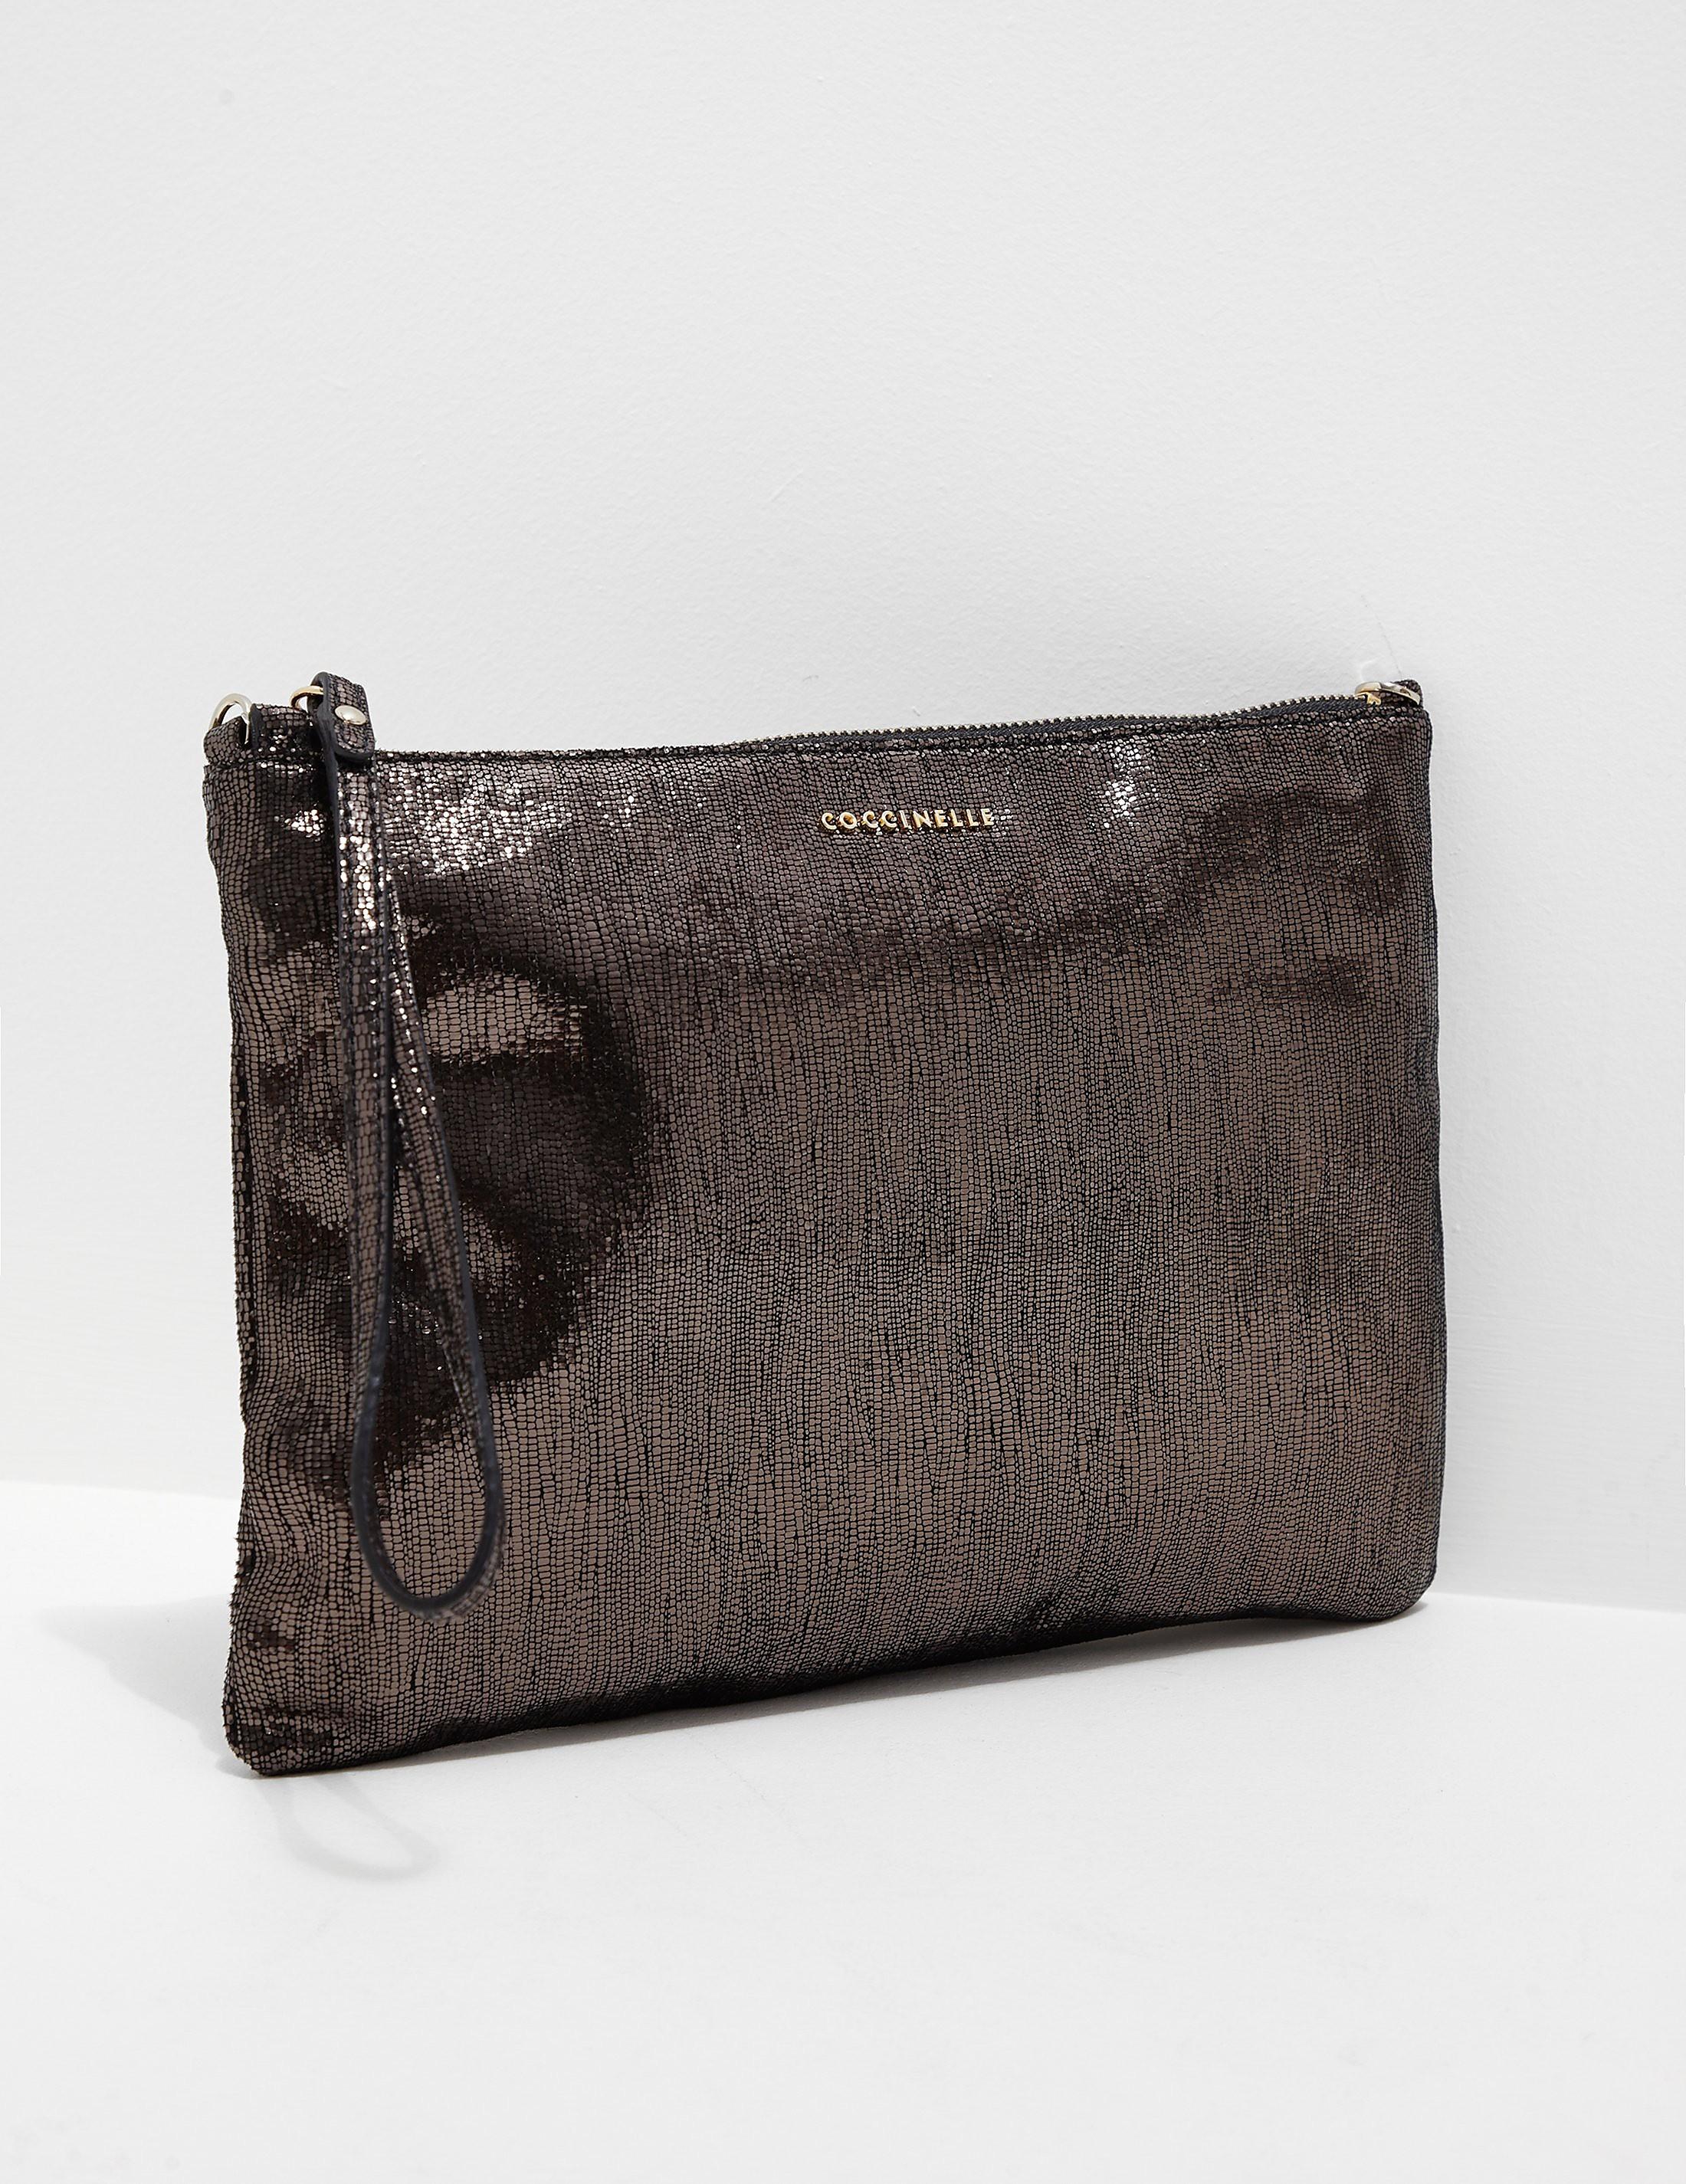 Coccinelle Glitter Clutch Bag